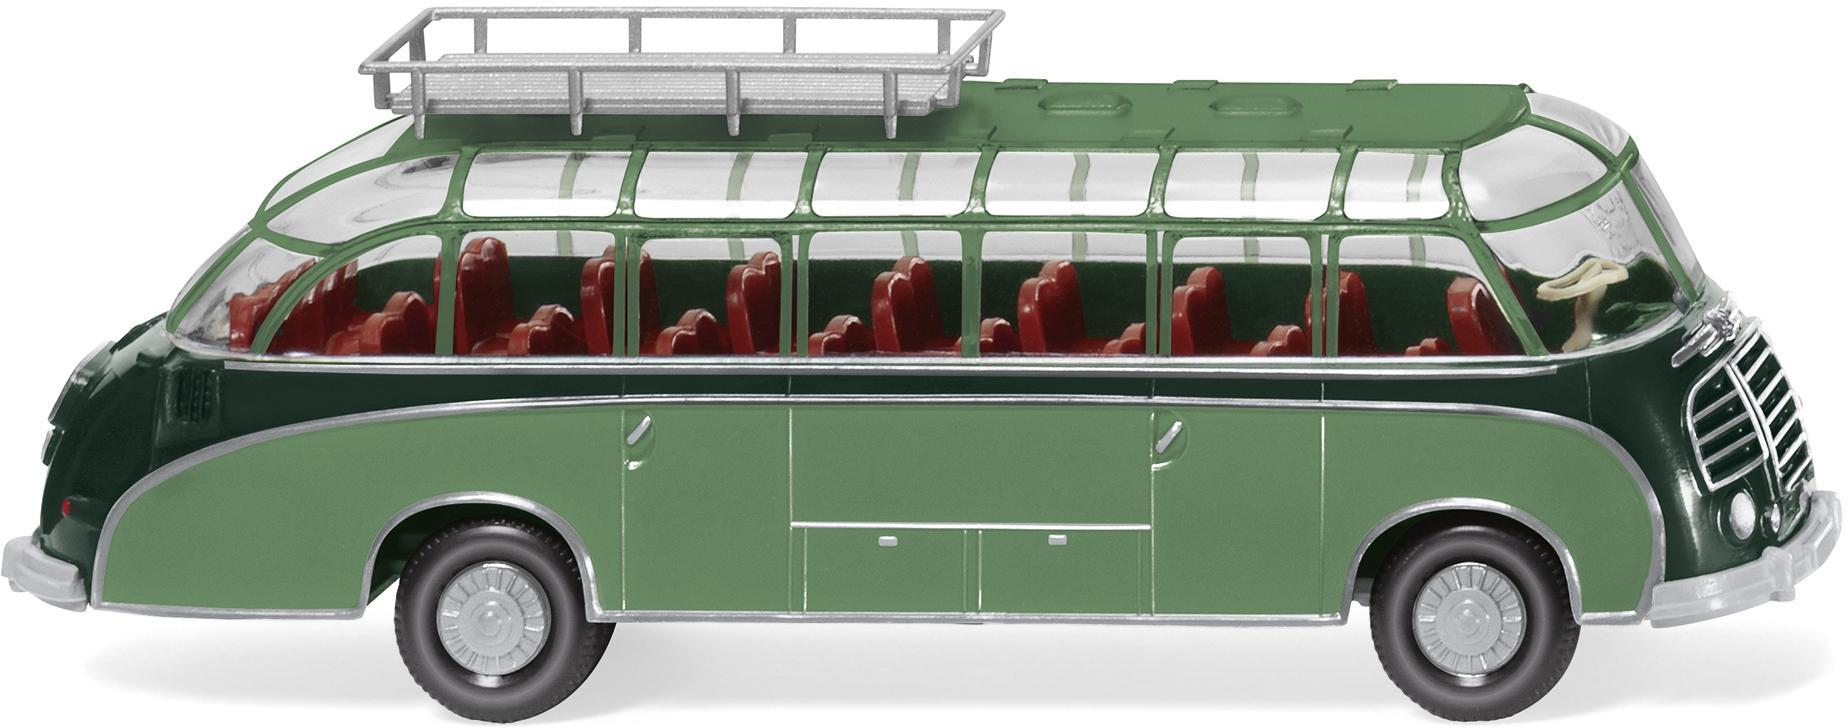 WIKING 73002 Reisebus Setra S8 grün